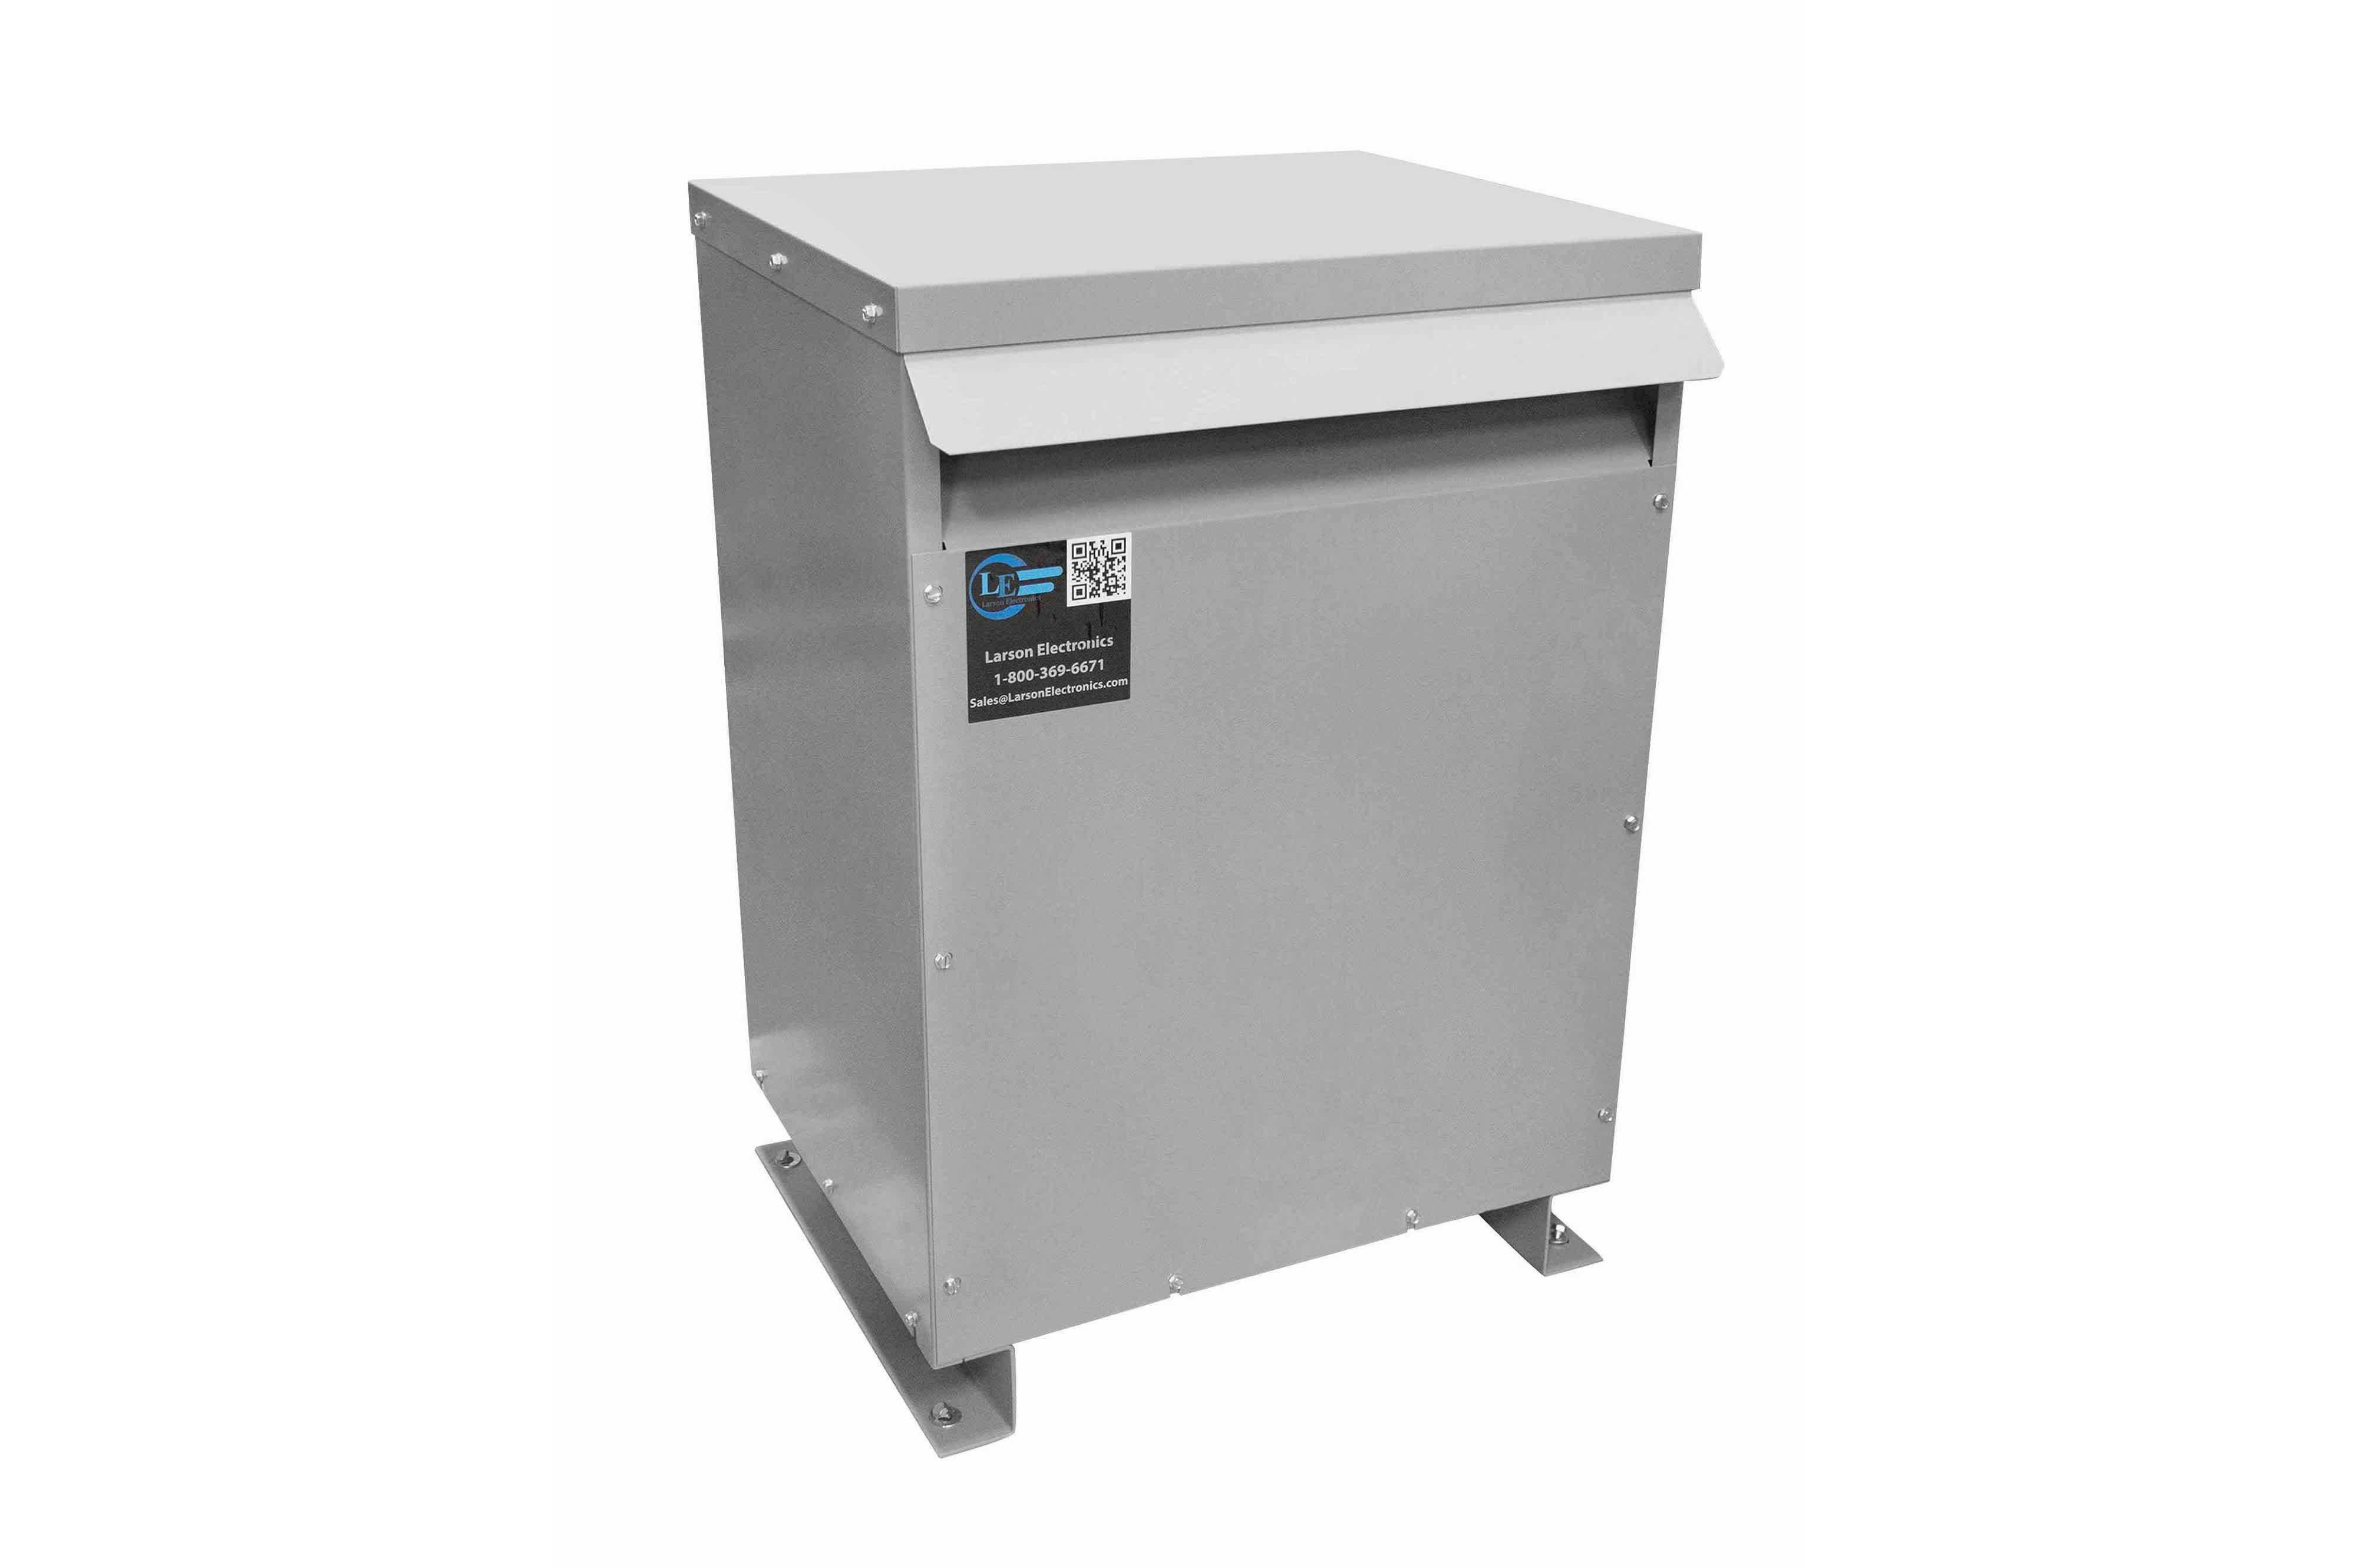 112.5 kVA 3PH DOE Transformer, 208V Delta Primary, 415Y/240 Wye-N Secondary, N3R, Ventilated, 60 Hz